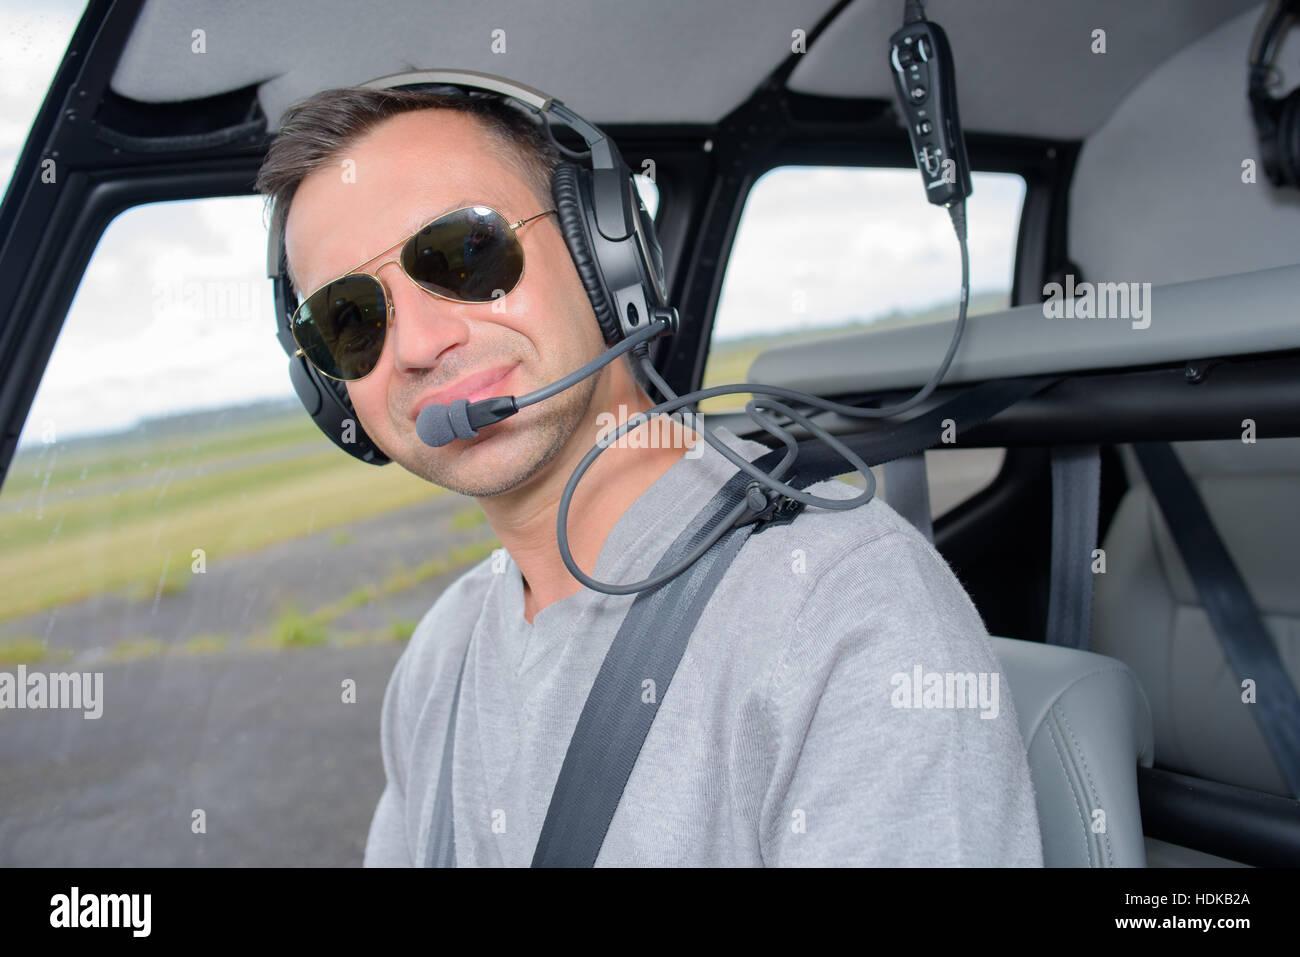 eb510af2b9 Portrait of pilot wearing sunglasses Stock Photo  128888882 - Alamy